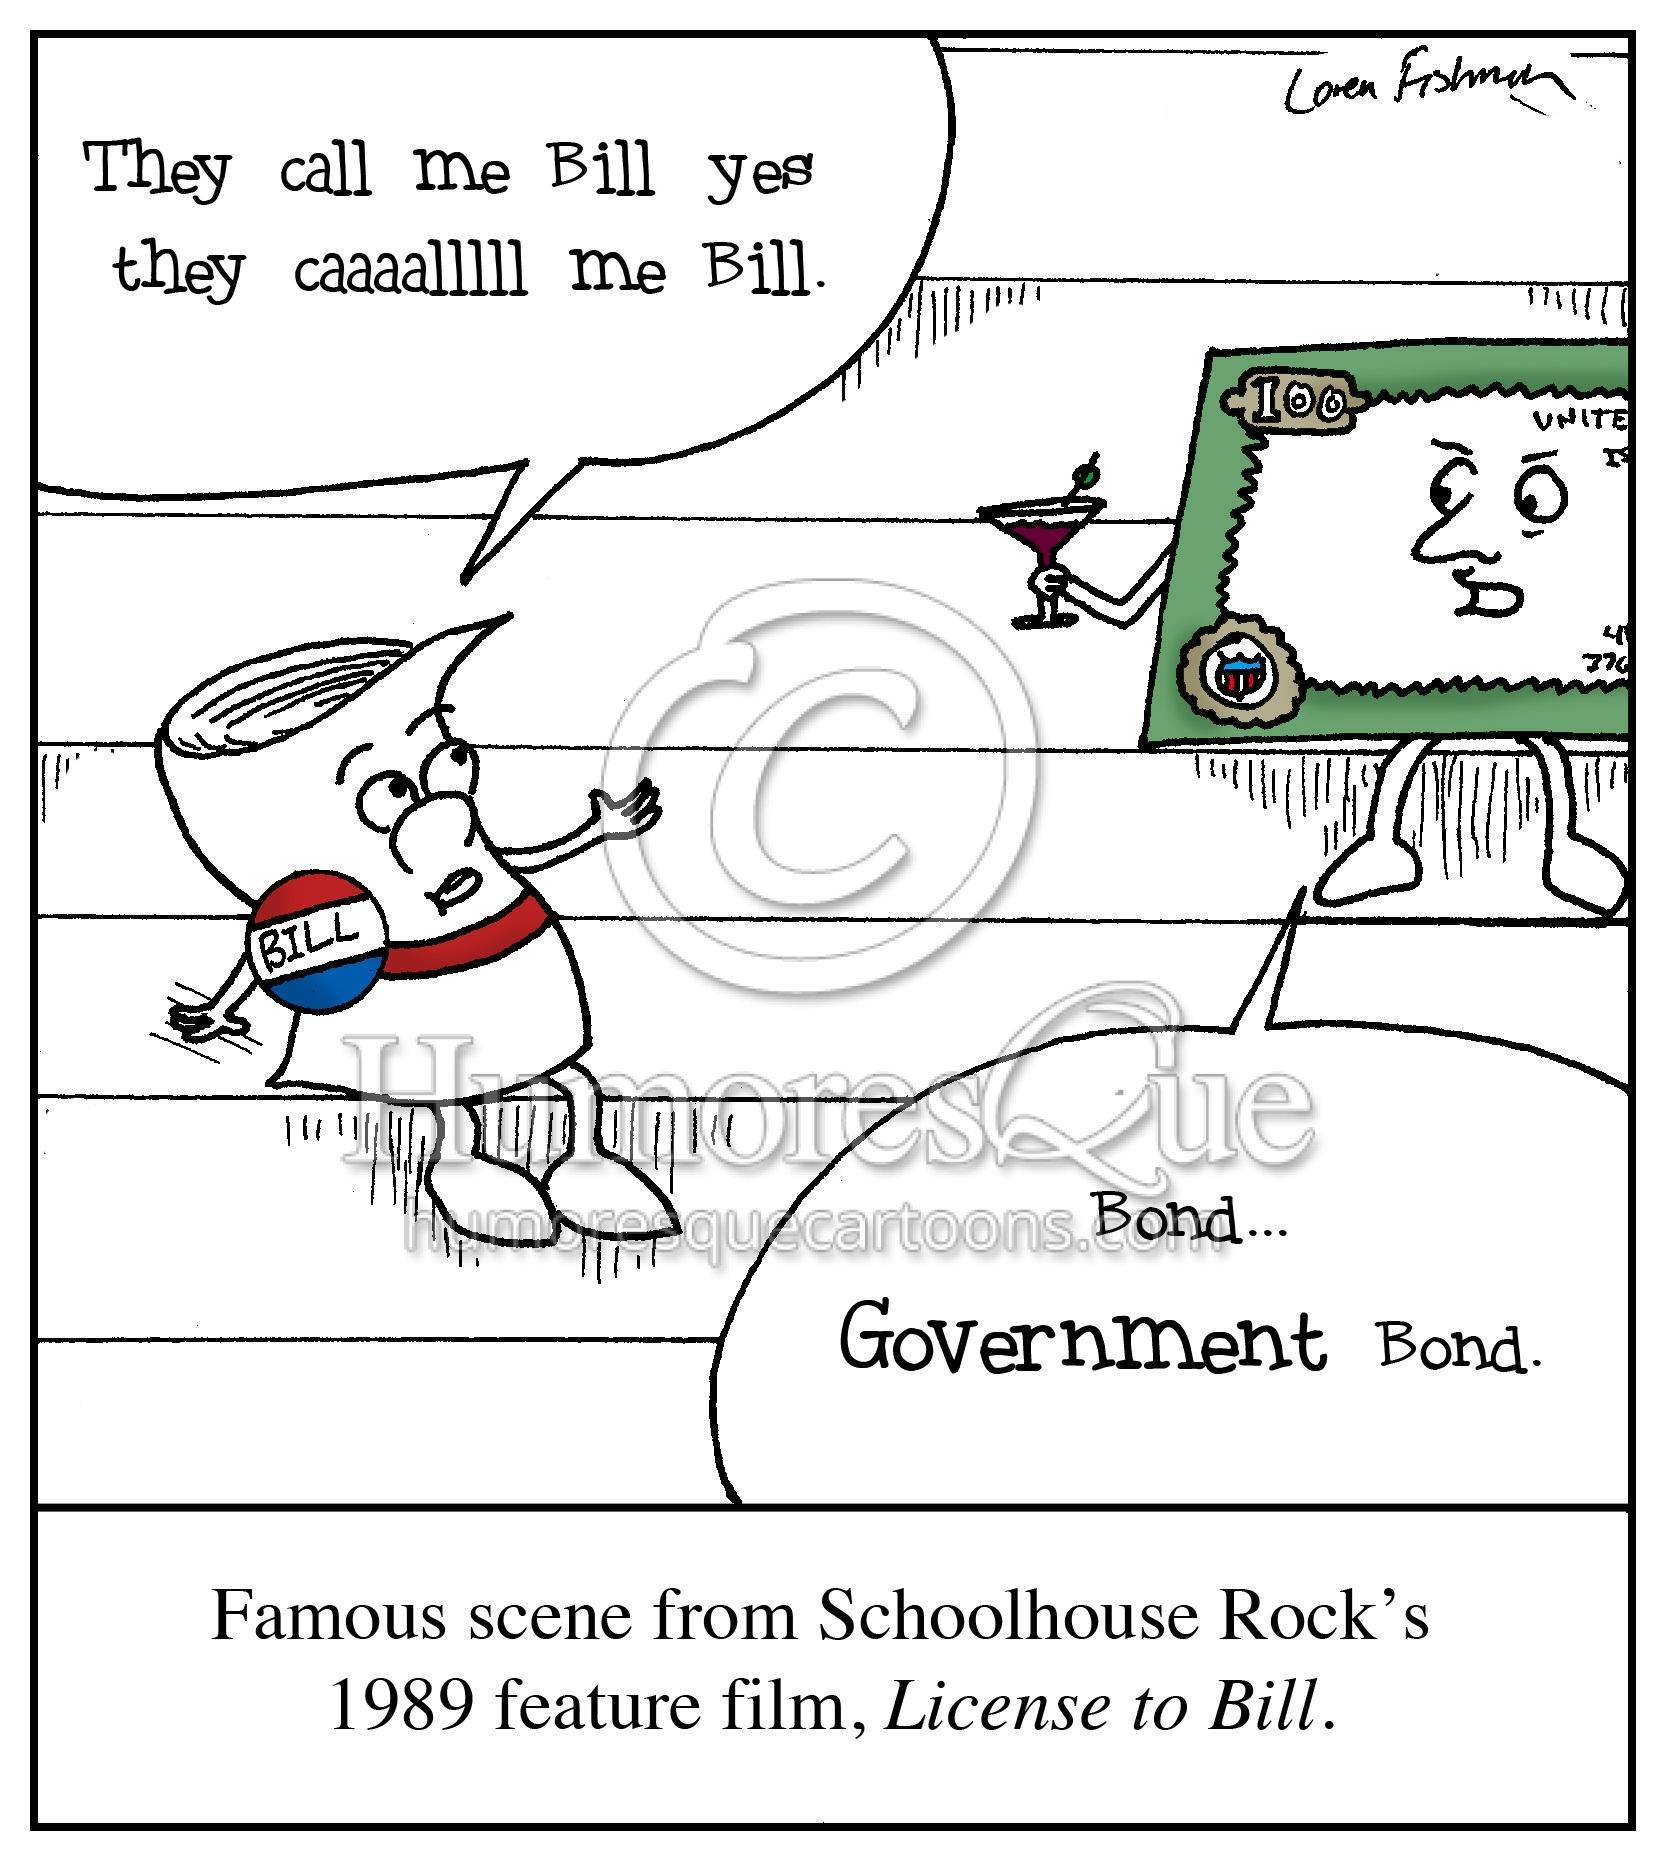 license to bill schoolhouse rock parody cartoon